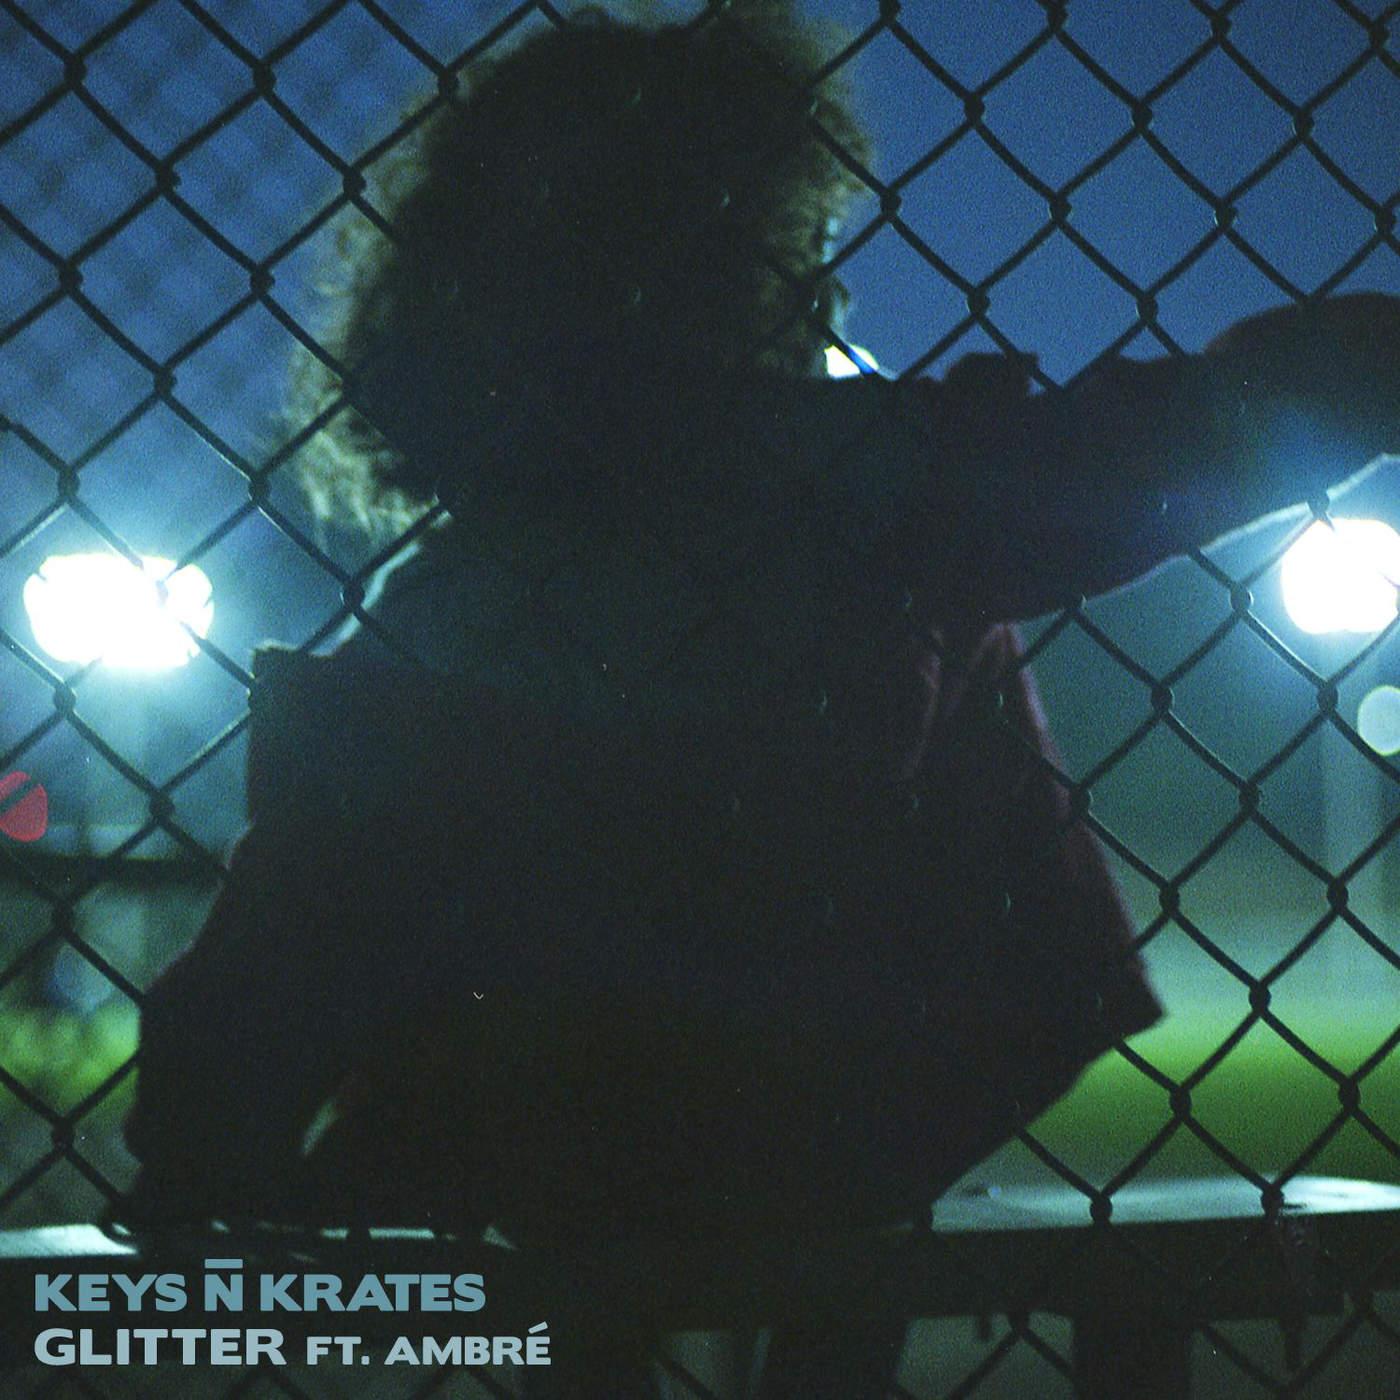 Keys N Krates - Glitter (feat. Ambré Perkins) - Single